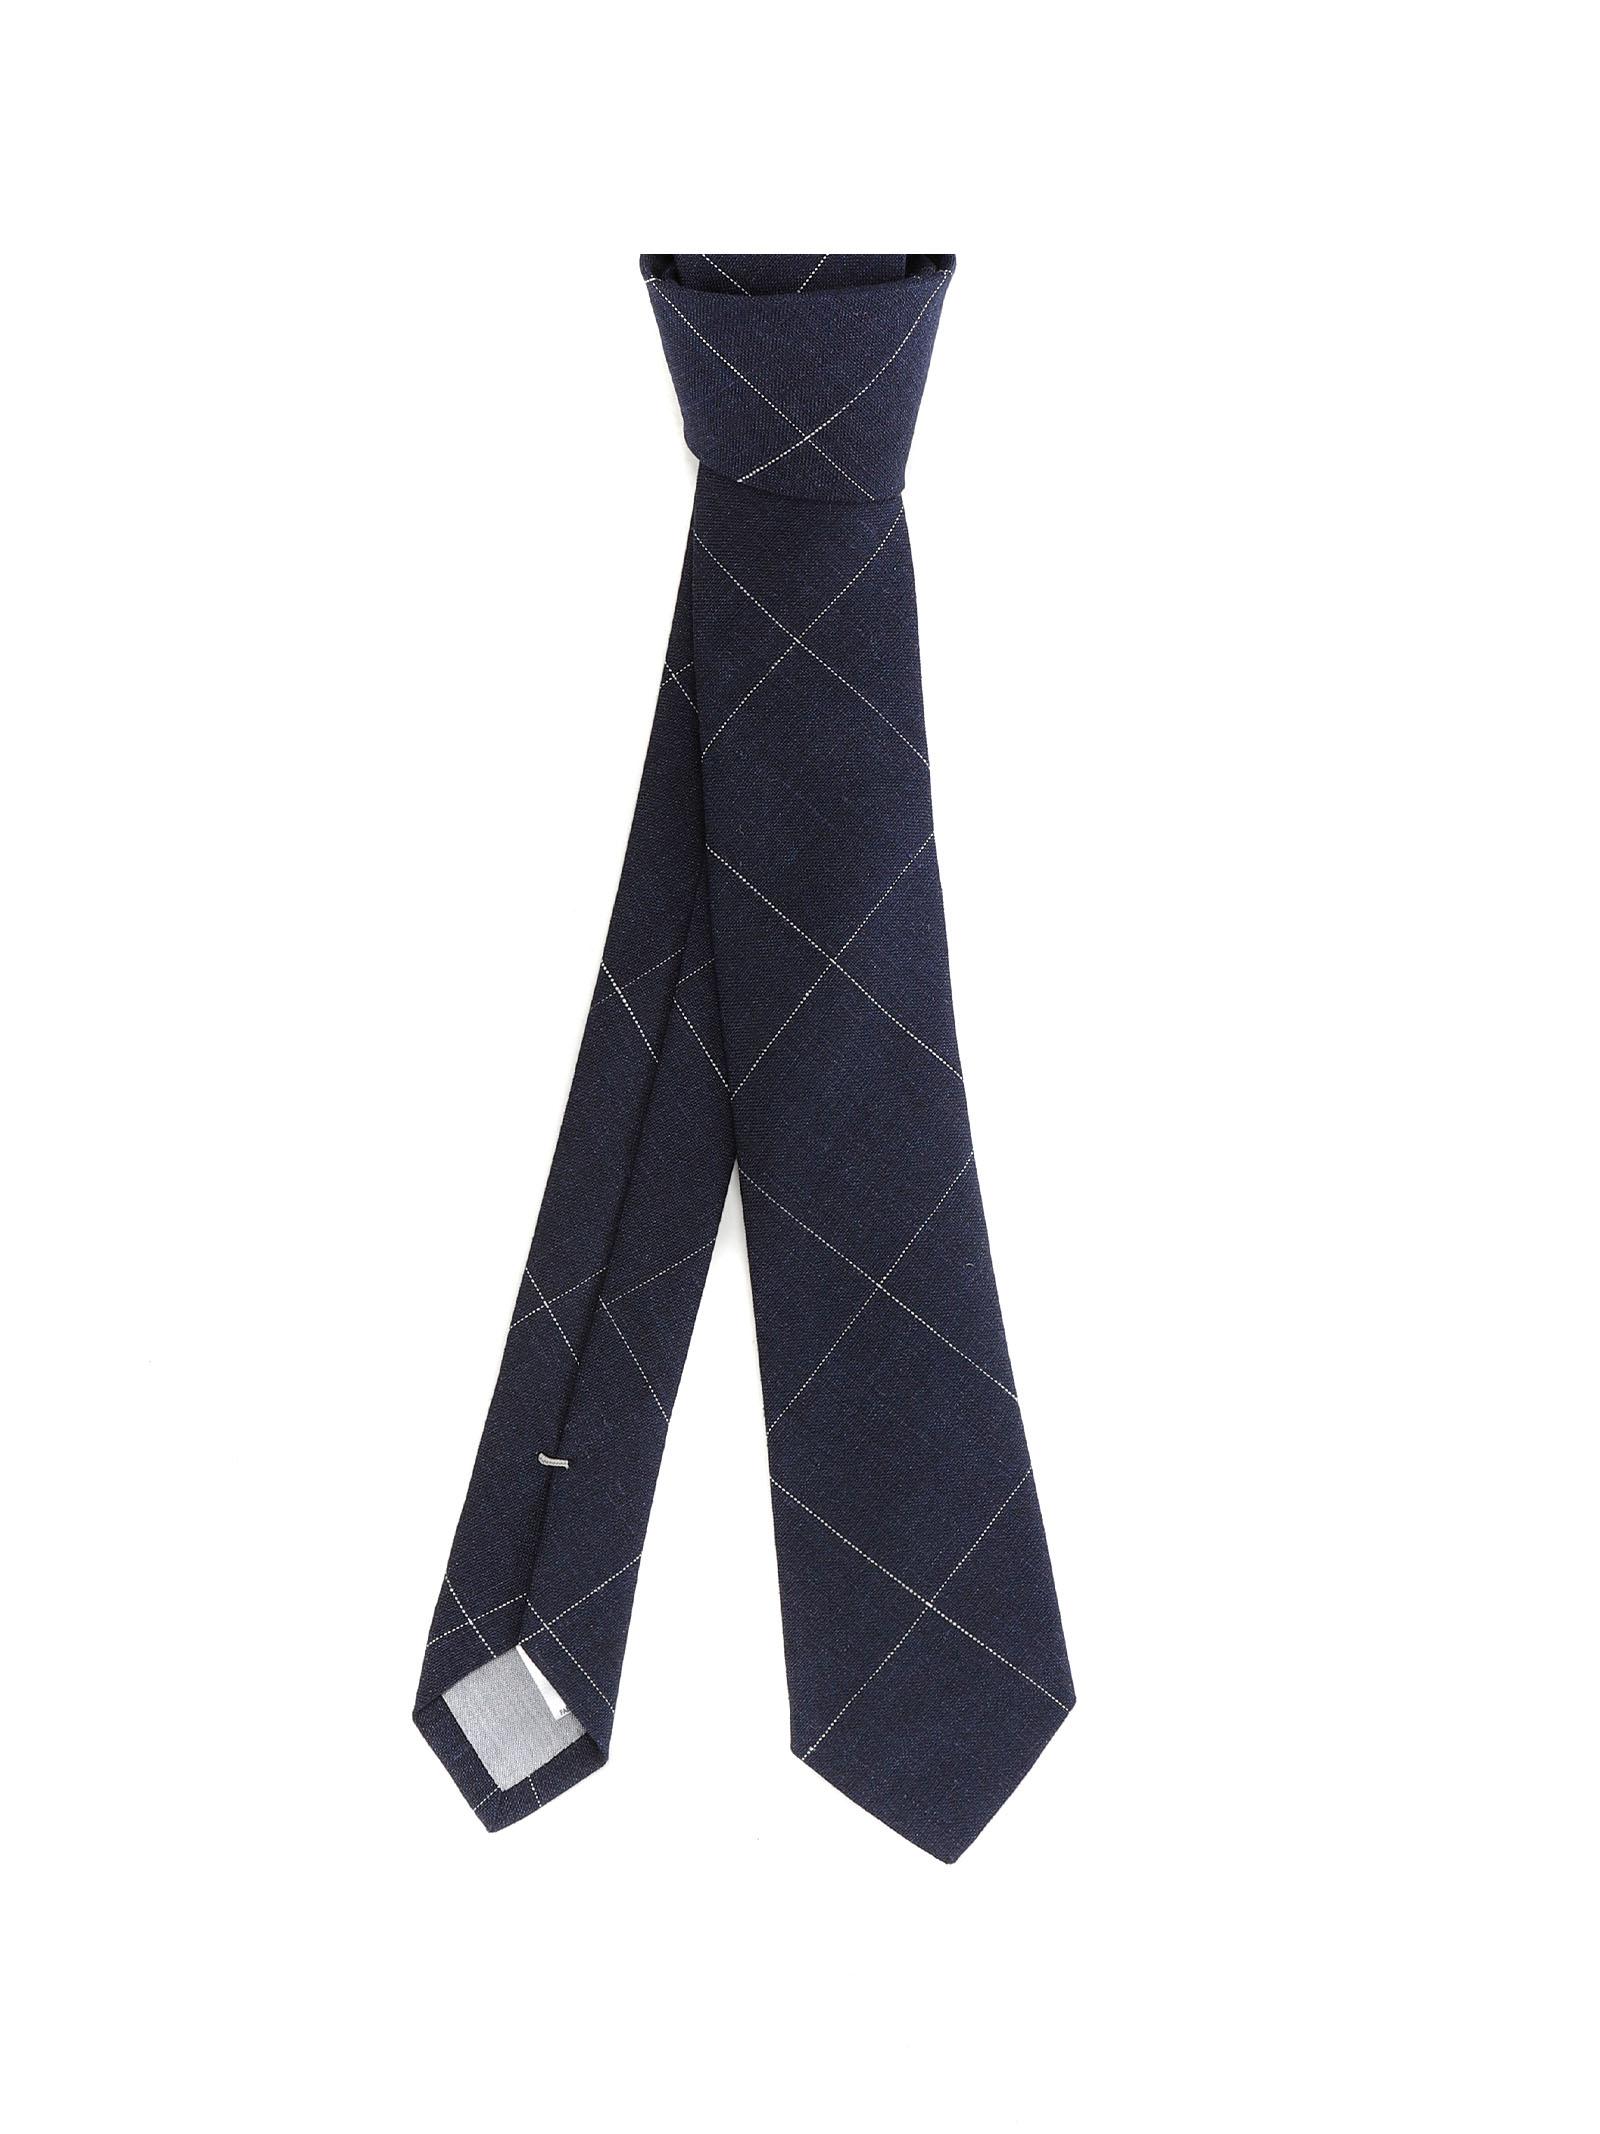 Blue linen check pattern tie  ELEVENTY |  | C77CRAA01-CRA0C03211